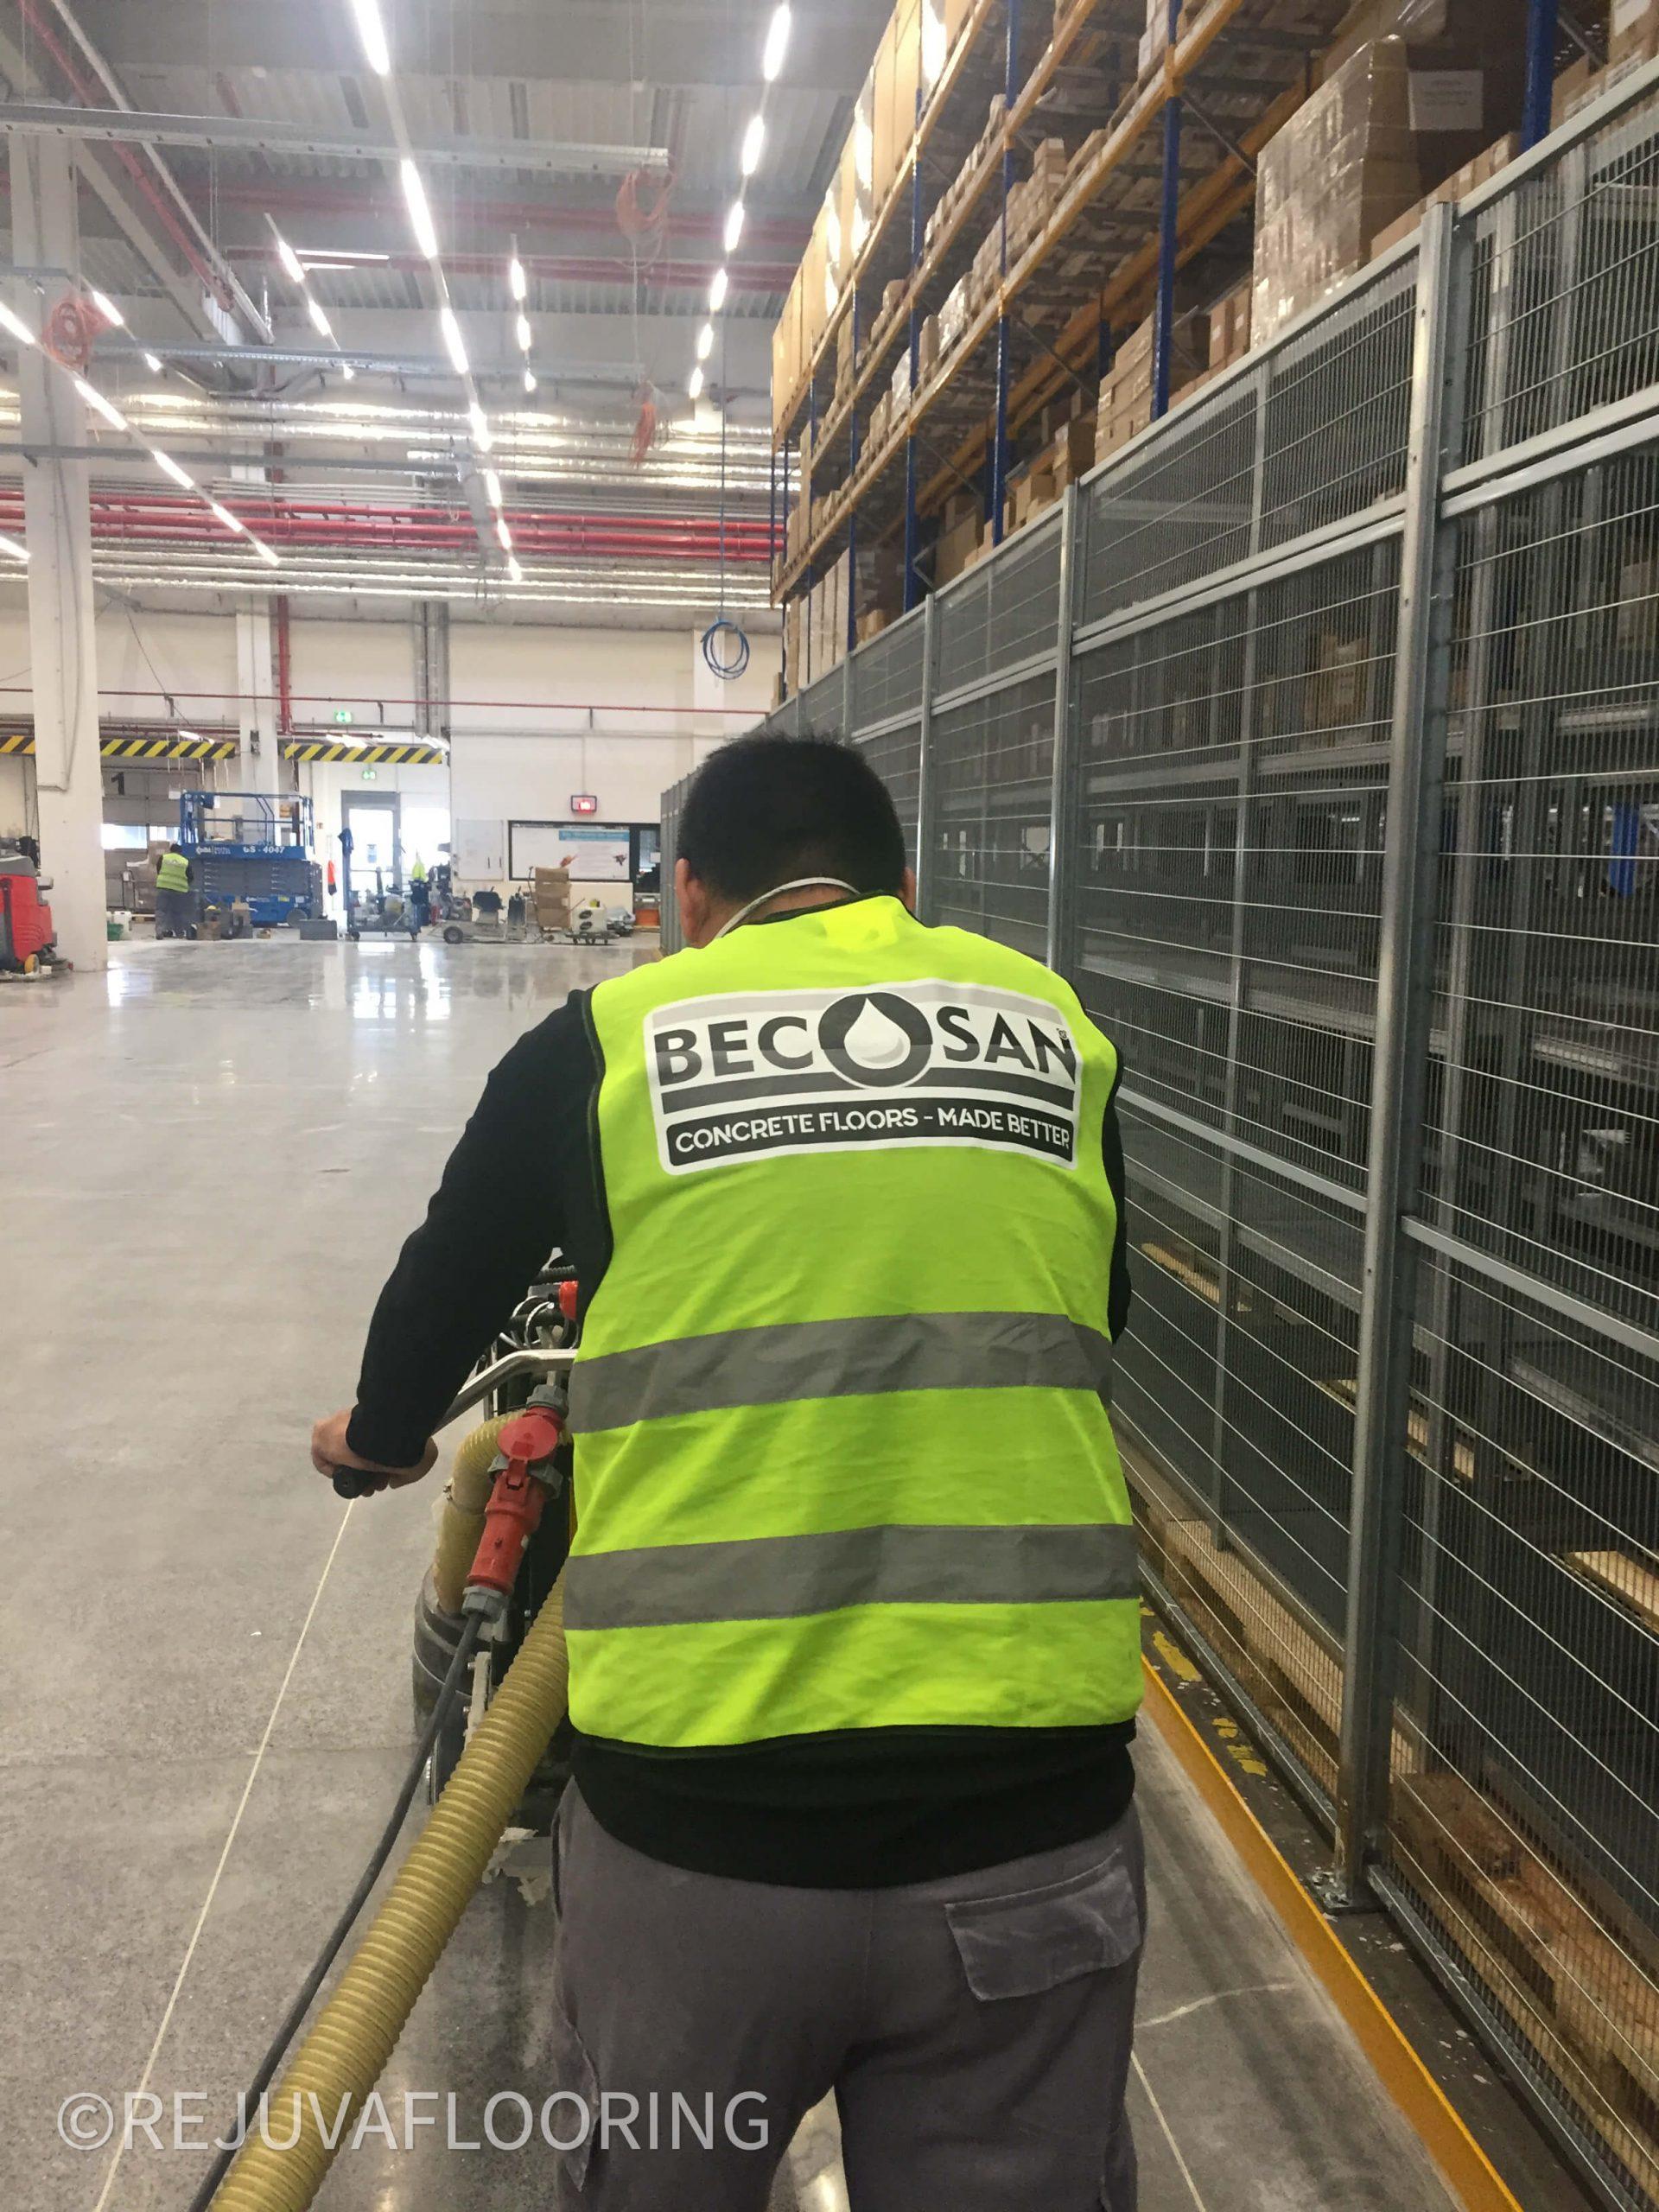 Becosan Concrete Specialist